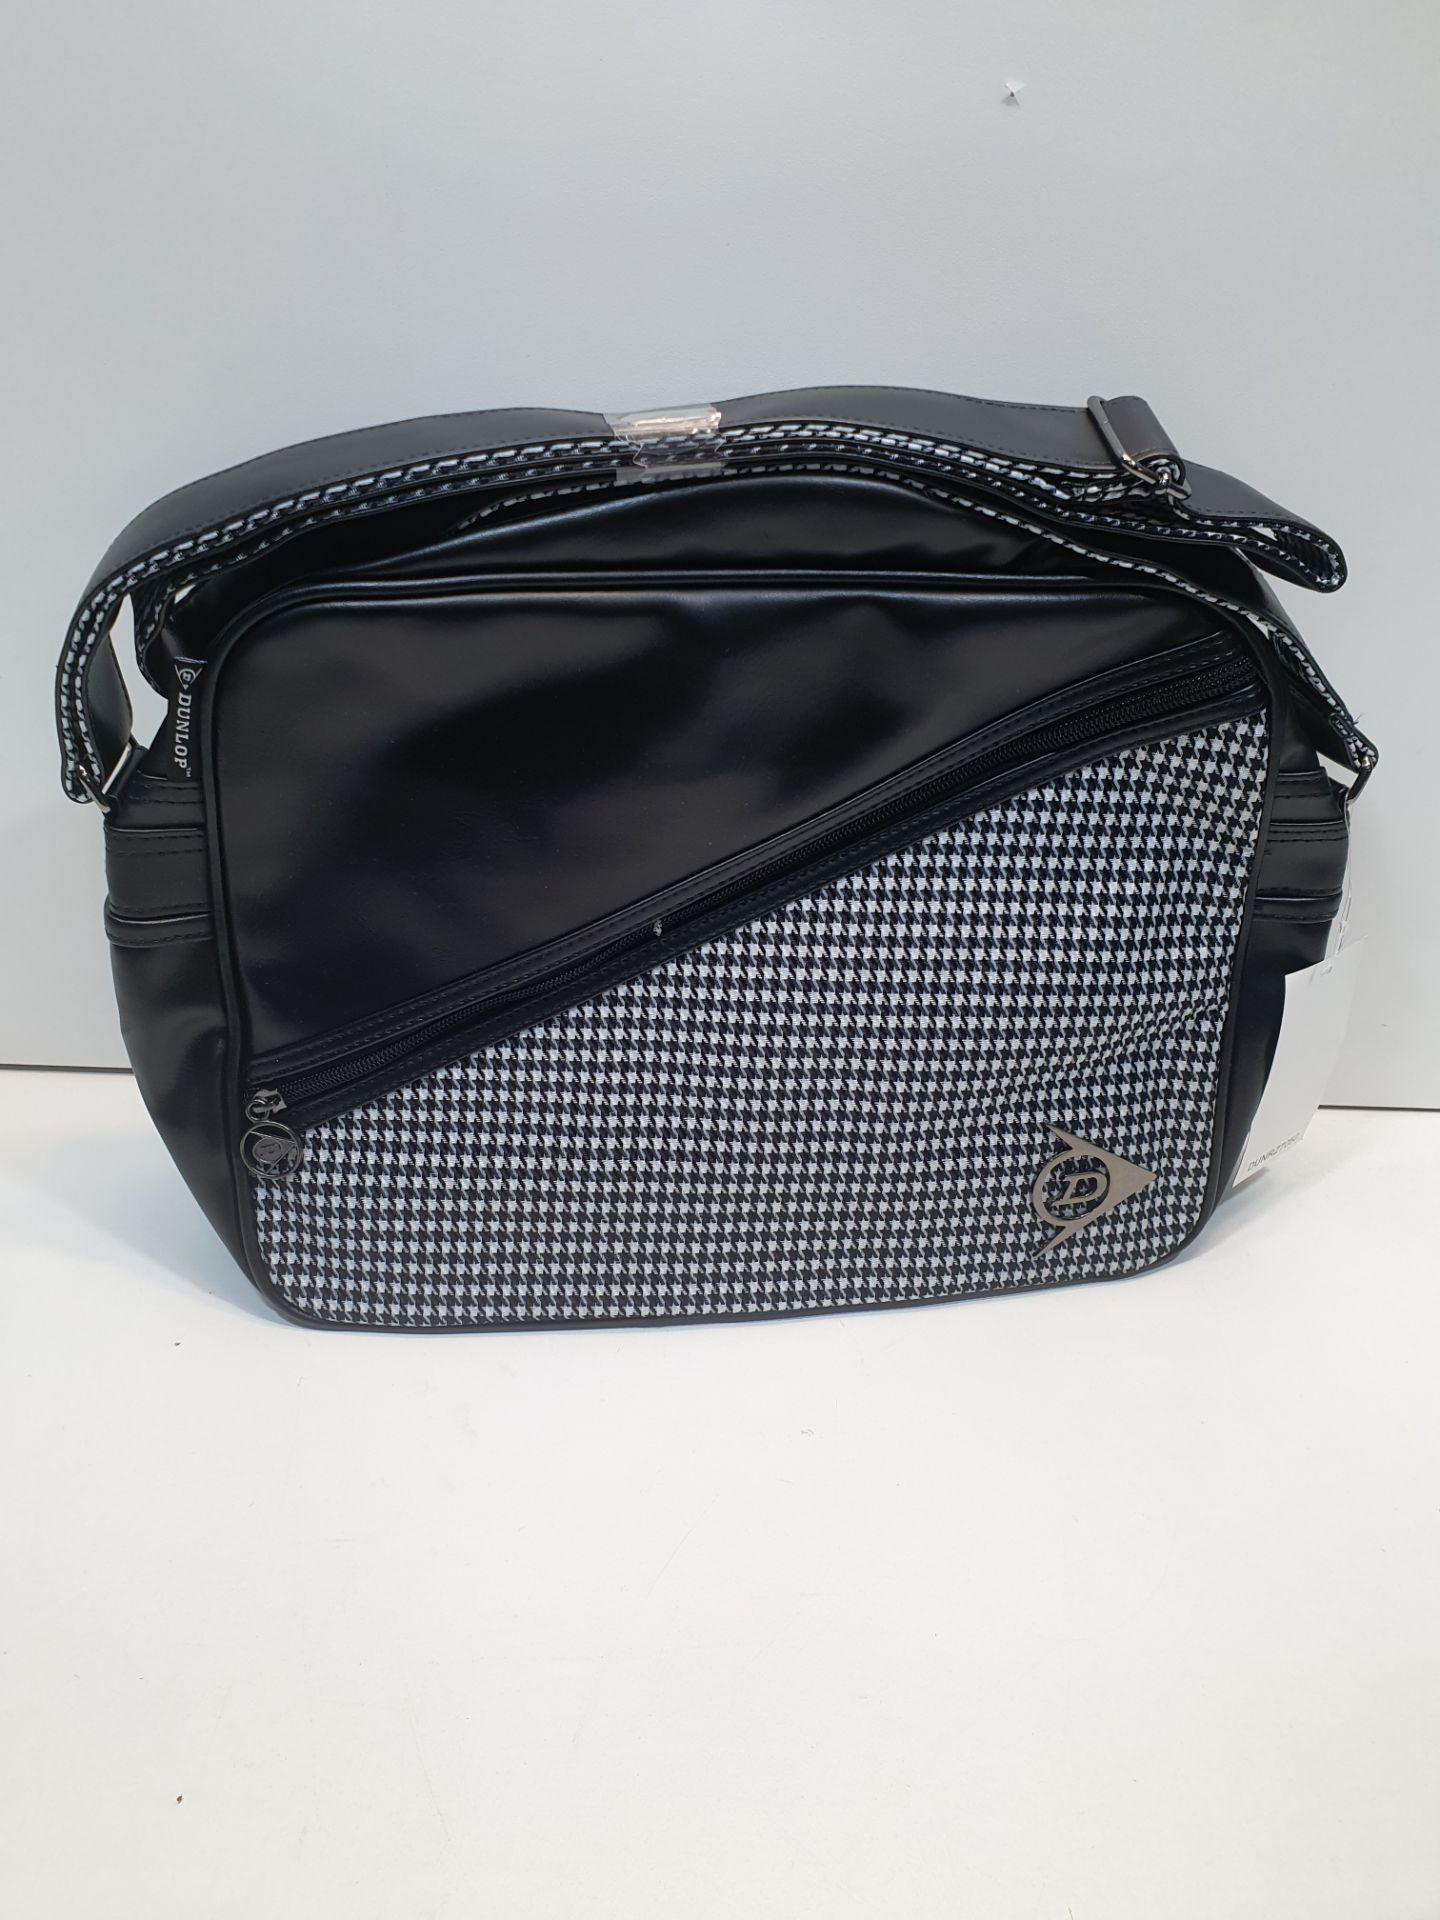 Dunlop PVC Flight Bag